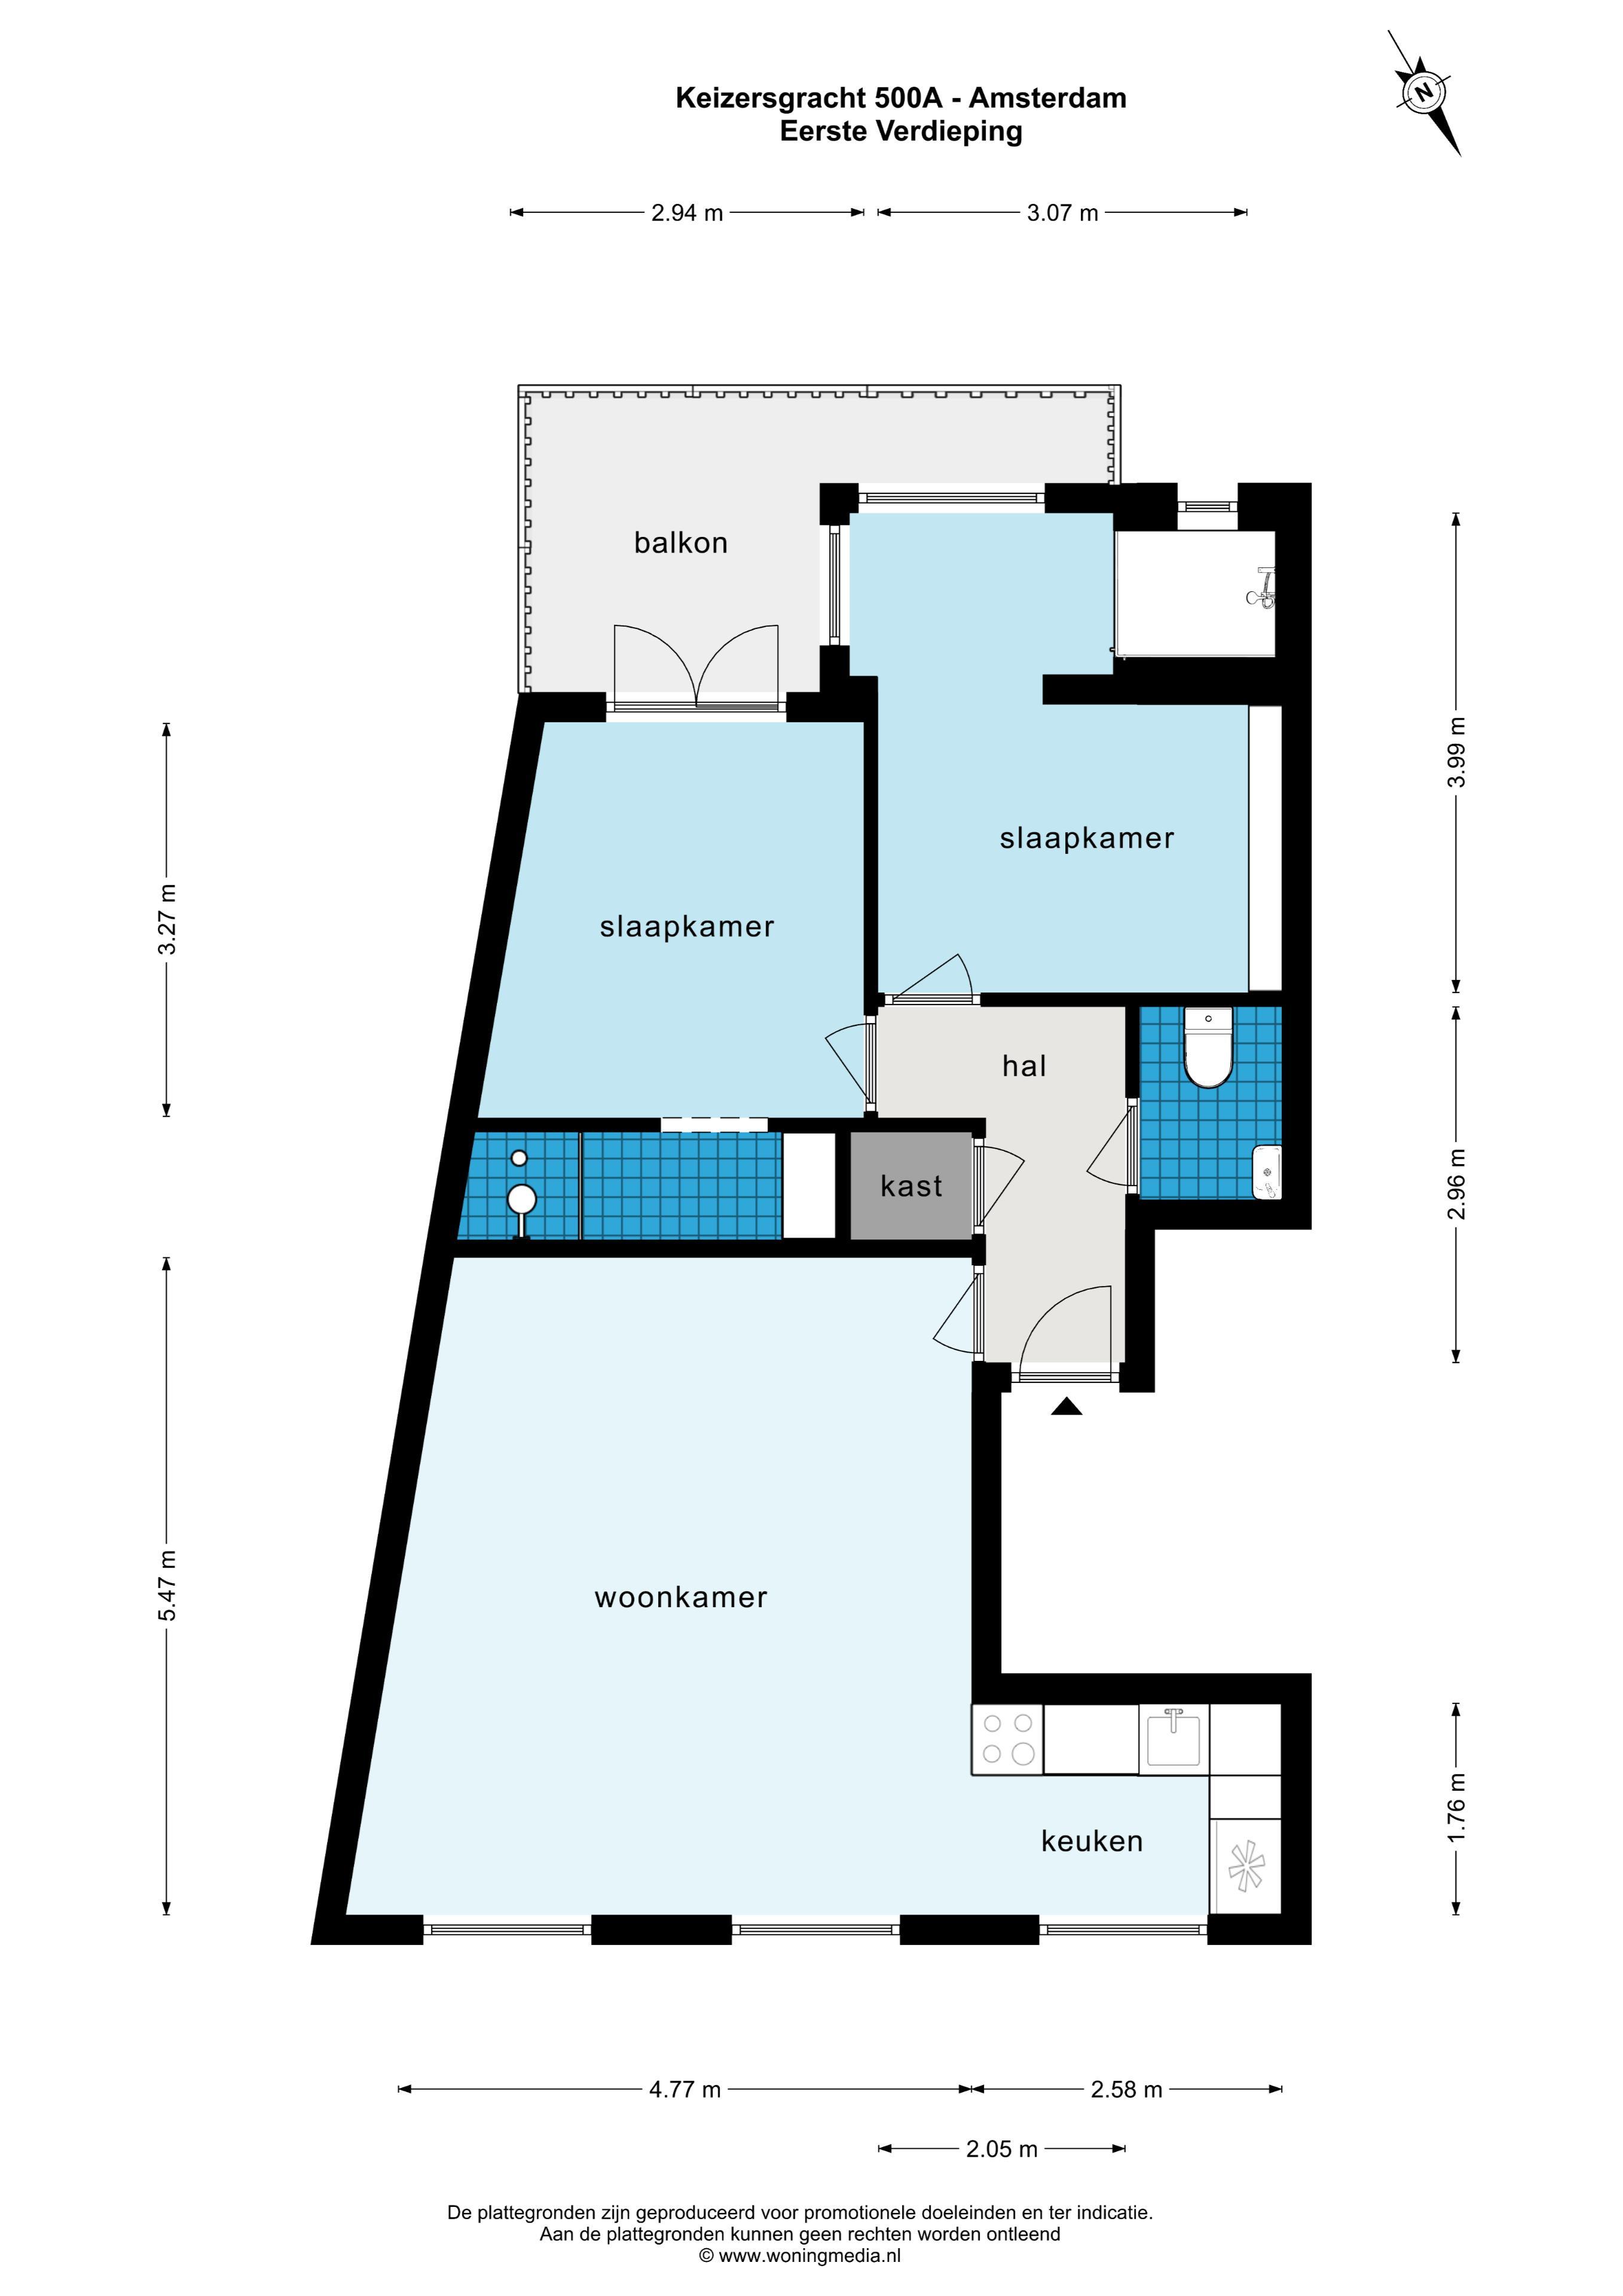 Keizersgracht 500 A, Amsterdam, Noord-Holland Nederland, 2 Bedrooms Bedrooms, ,1 BathroomBathrooms,Apartment,For Rent,Keizersgracht,2,1517